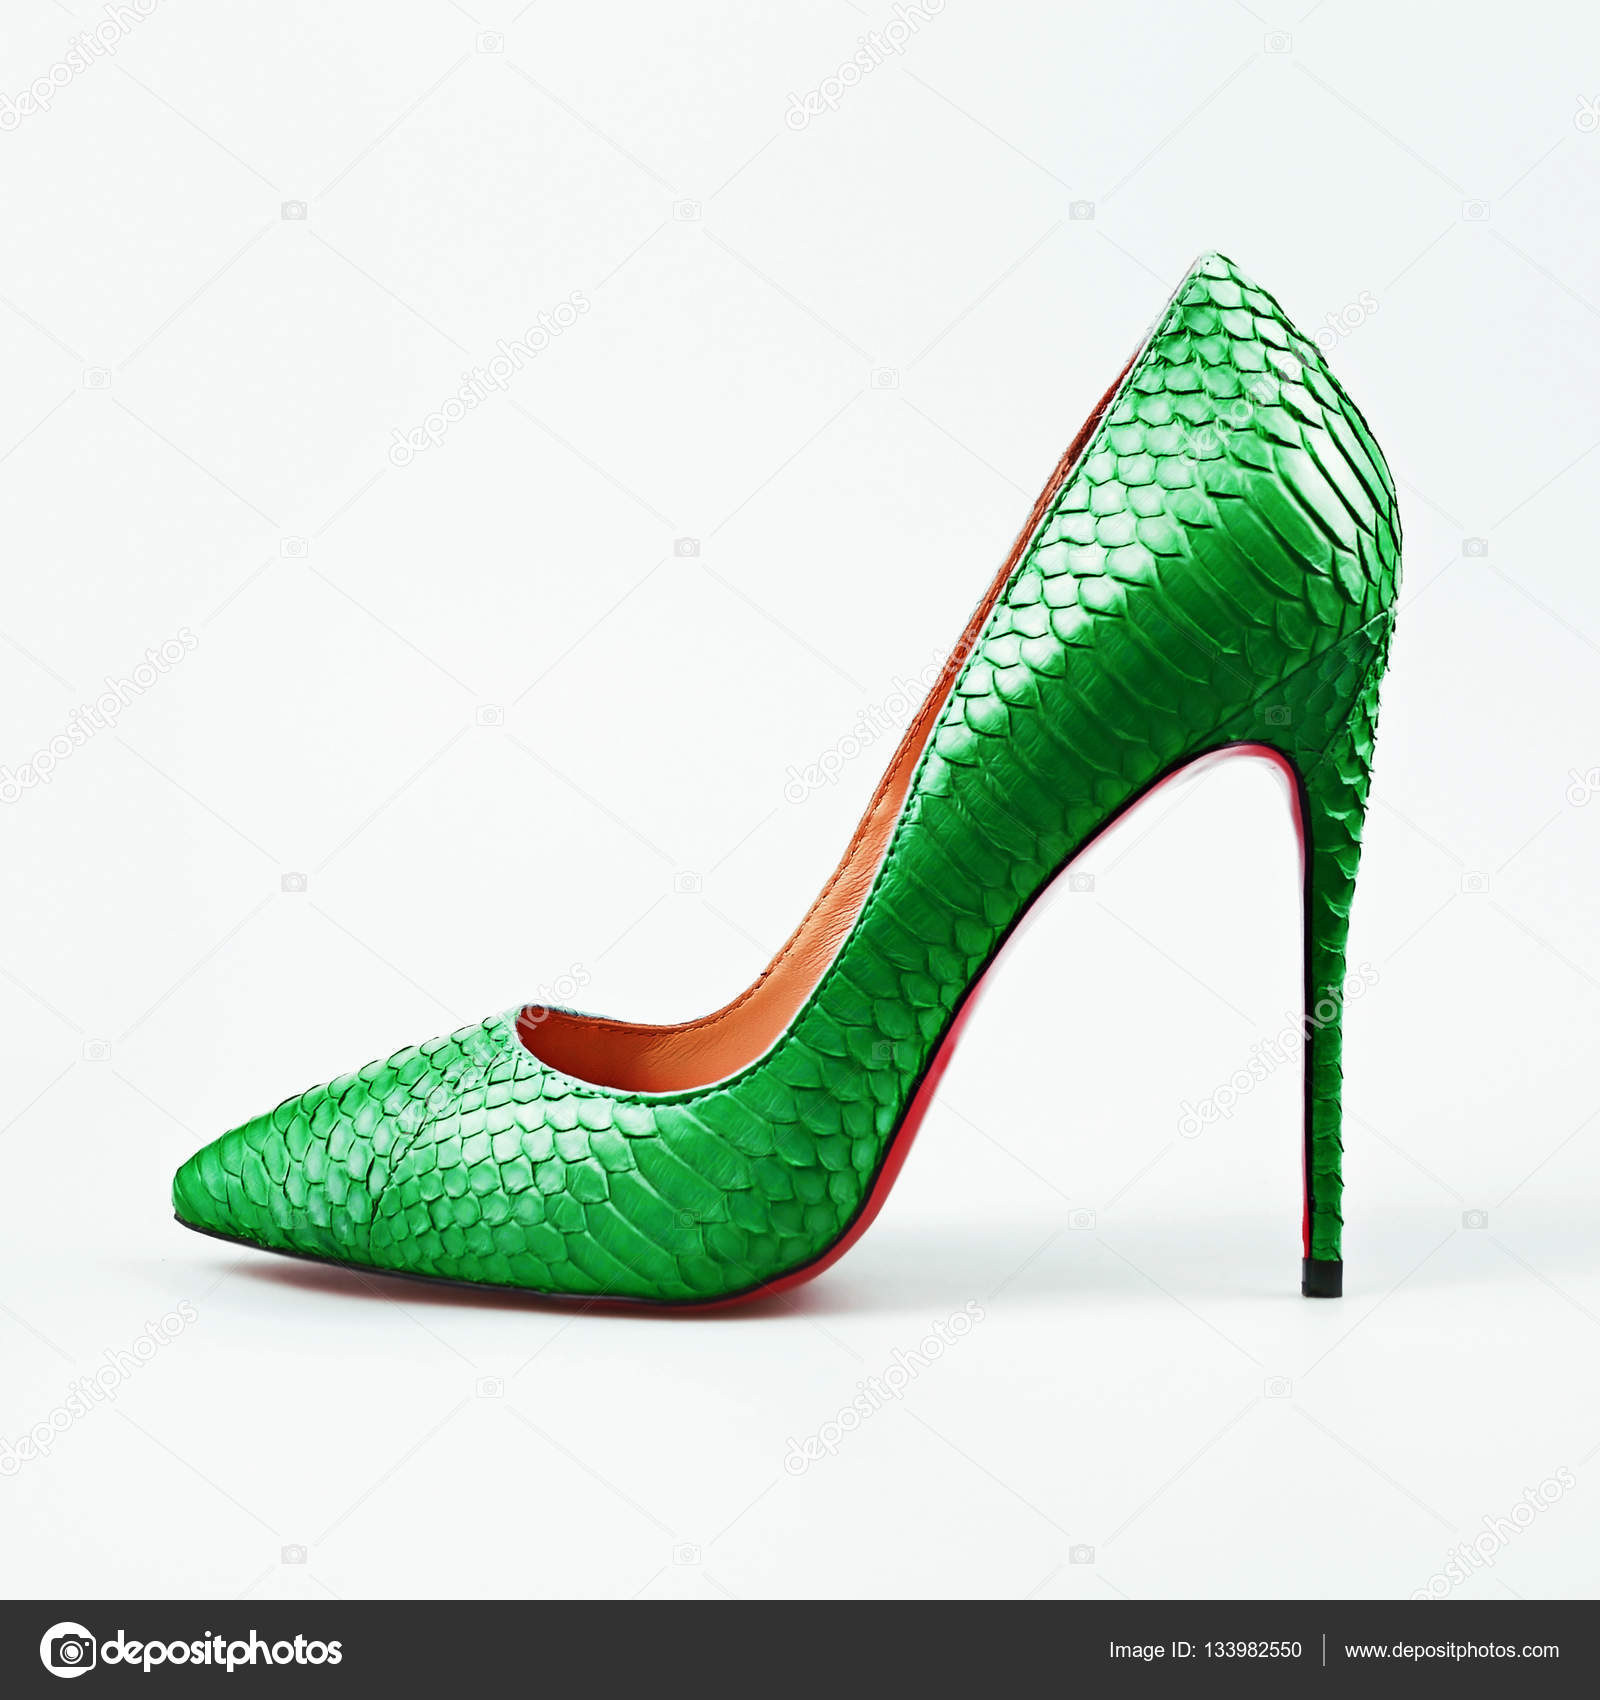 07aa024c2a07 Zapatos de mujer de tacón alto verdes sobre fondo blanco — Fotos de ...